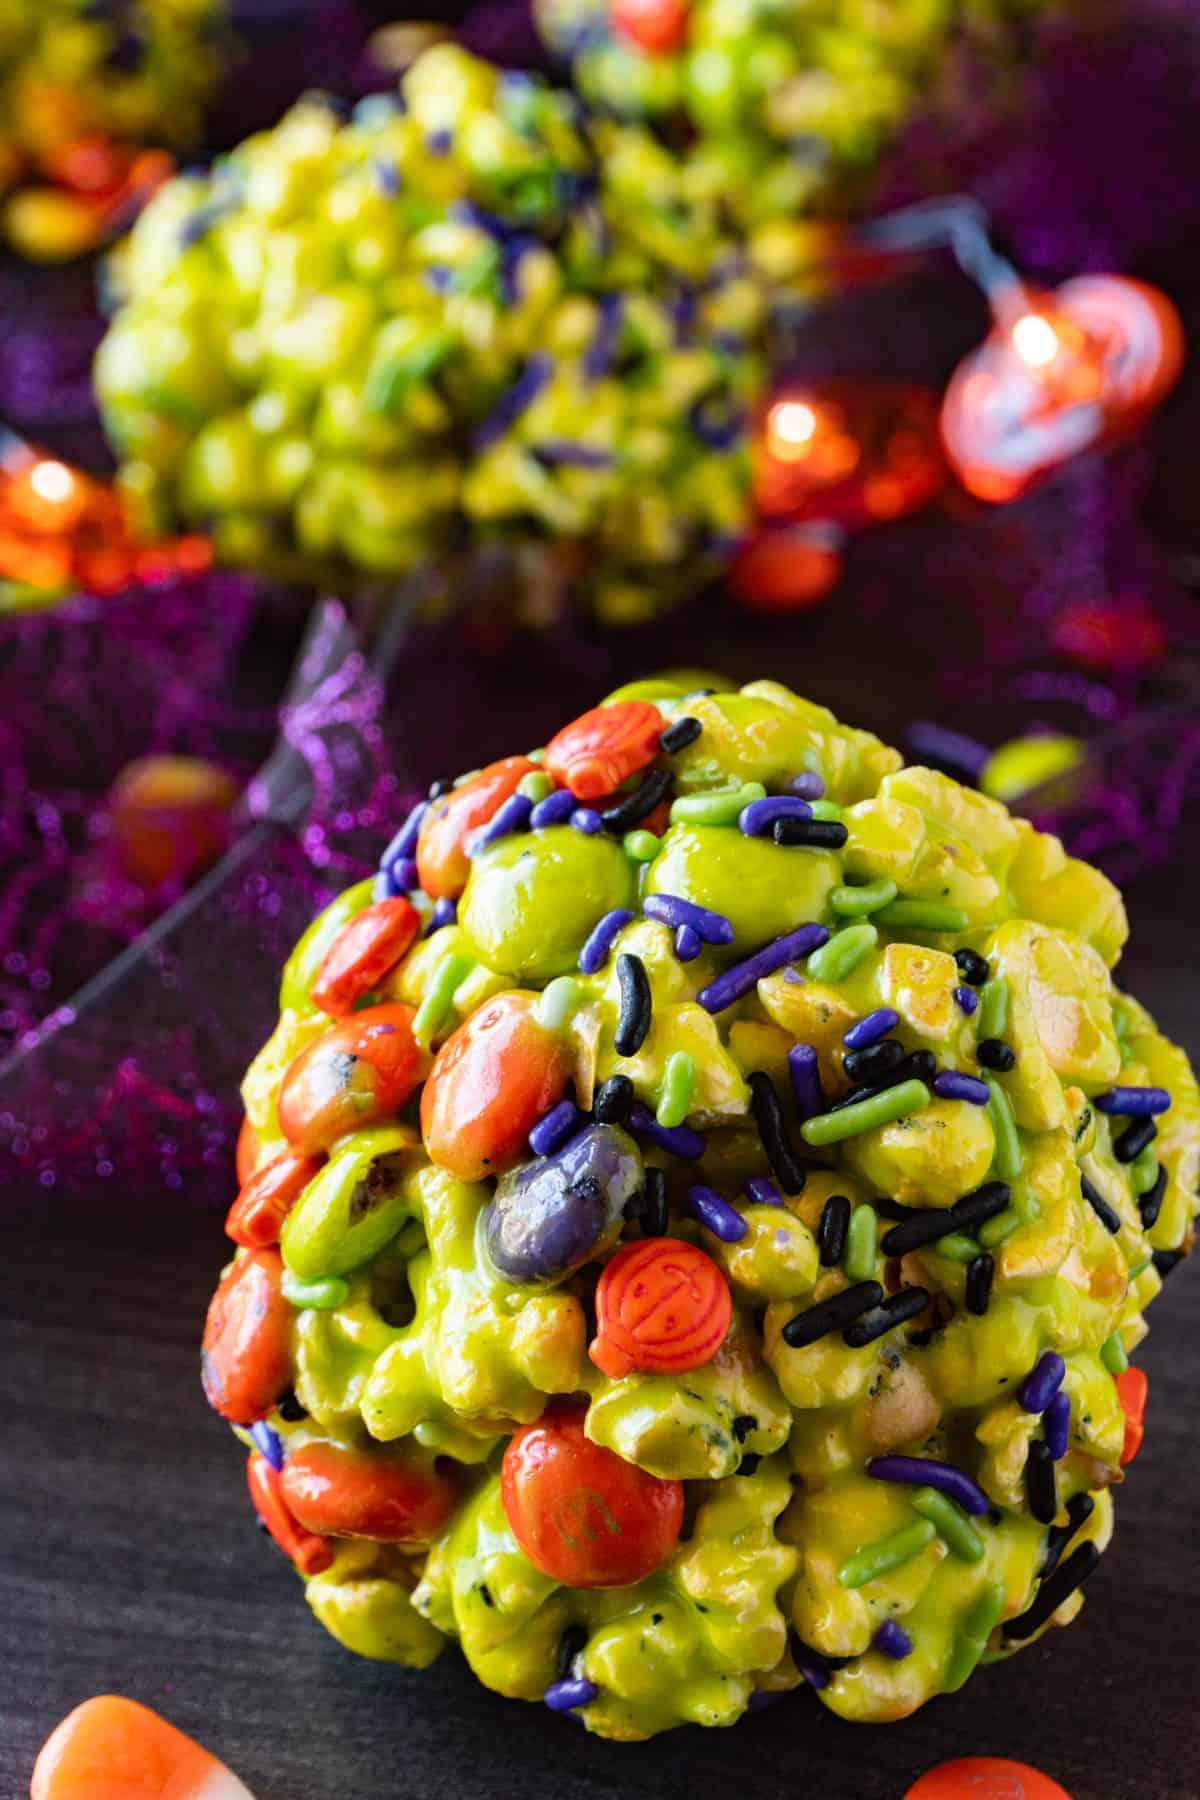 popcorn ball close up